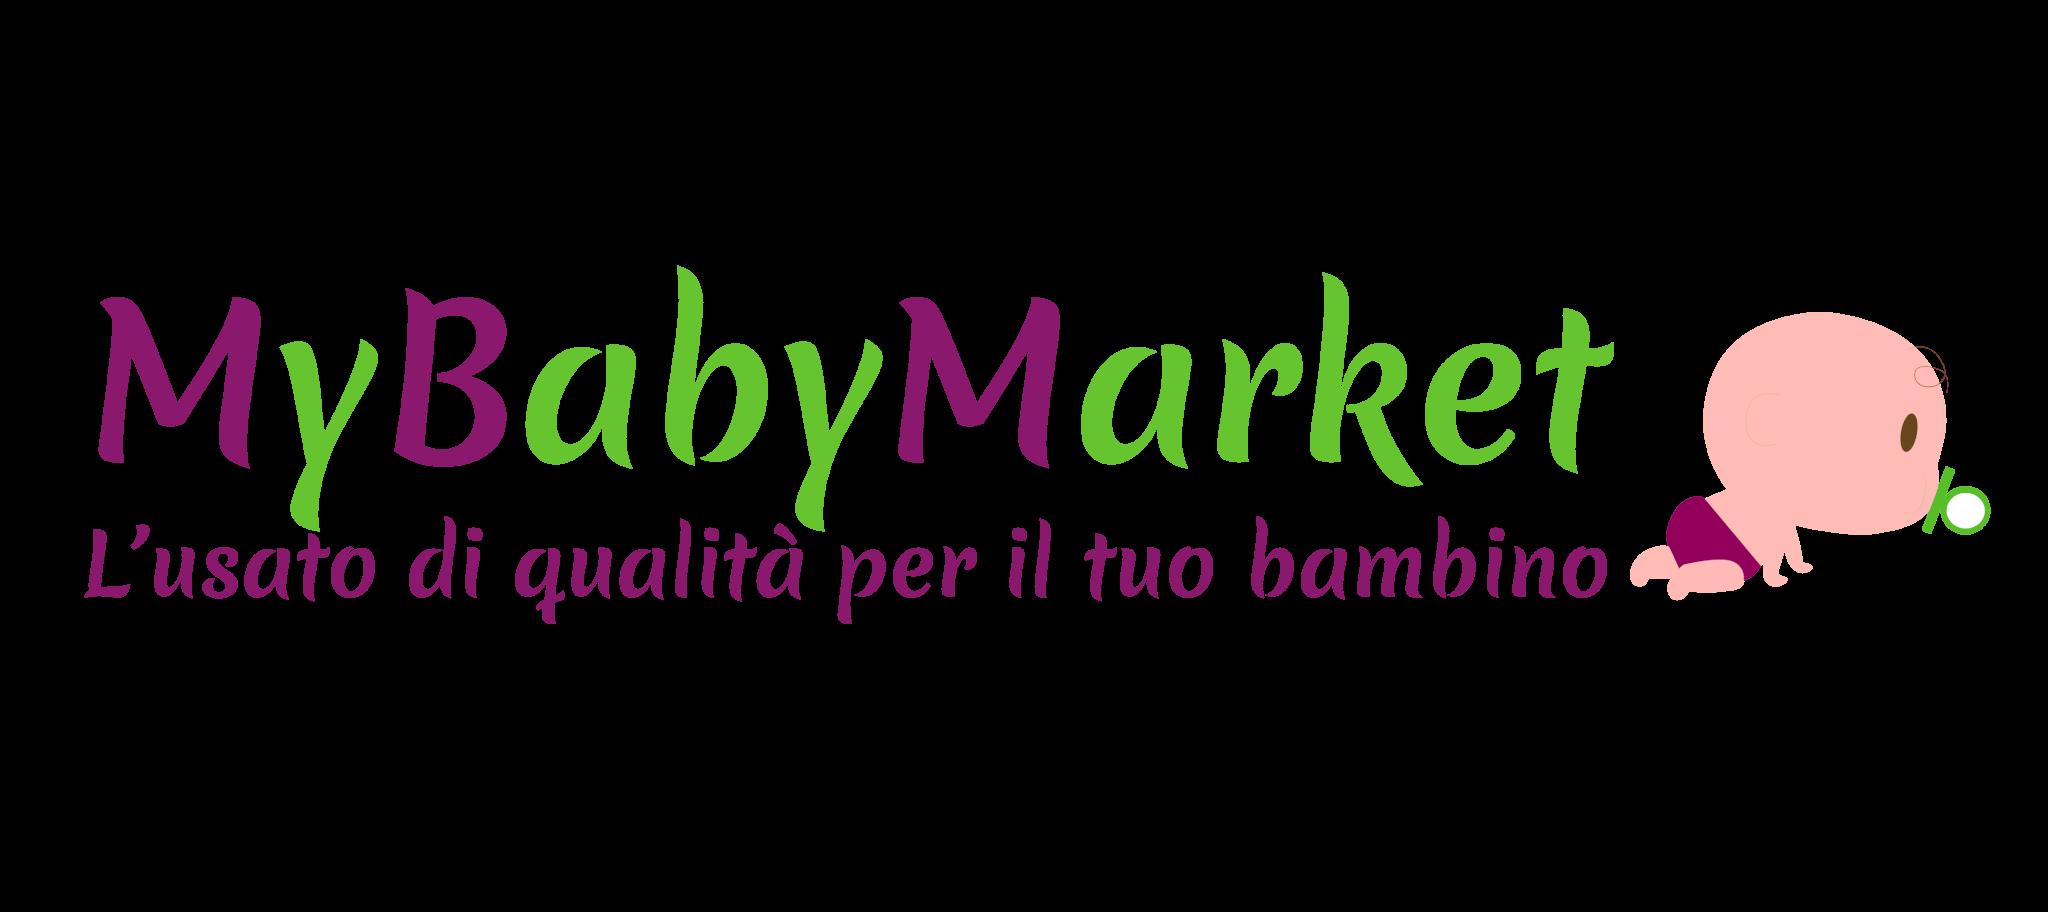 MyBabyMarket